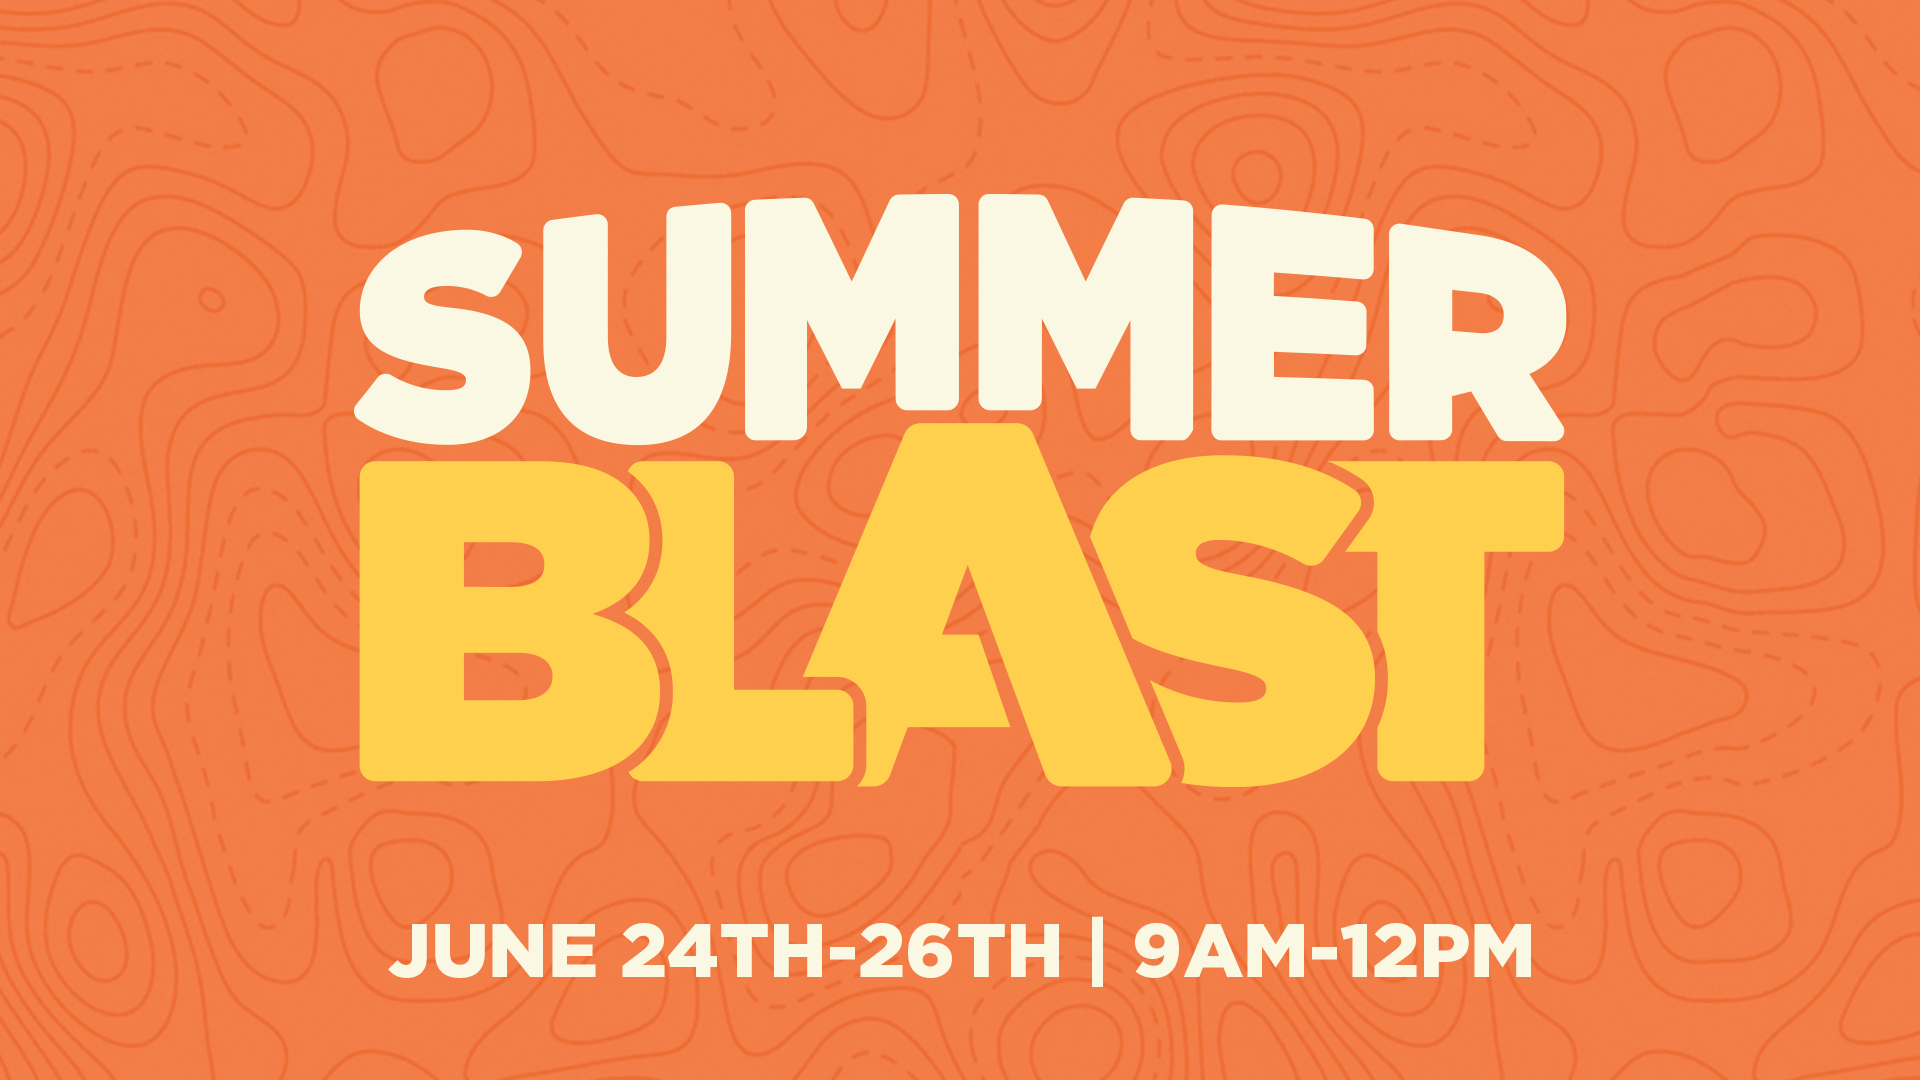 summer blast_1920x1080.jpg